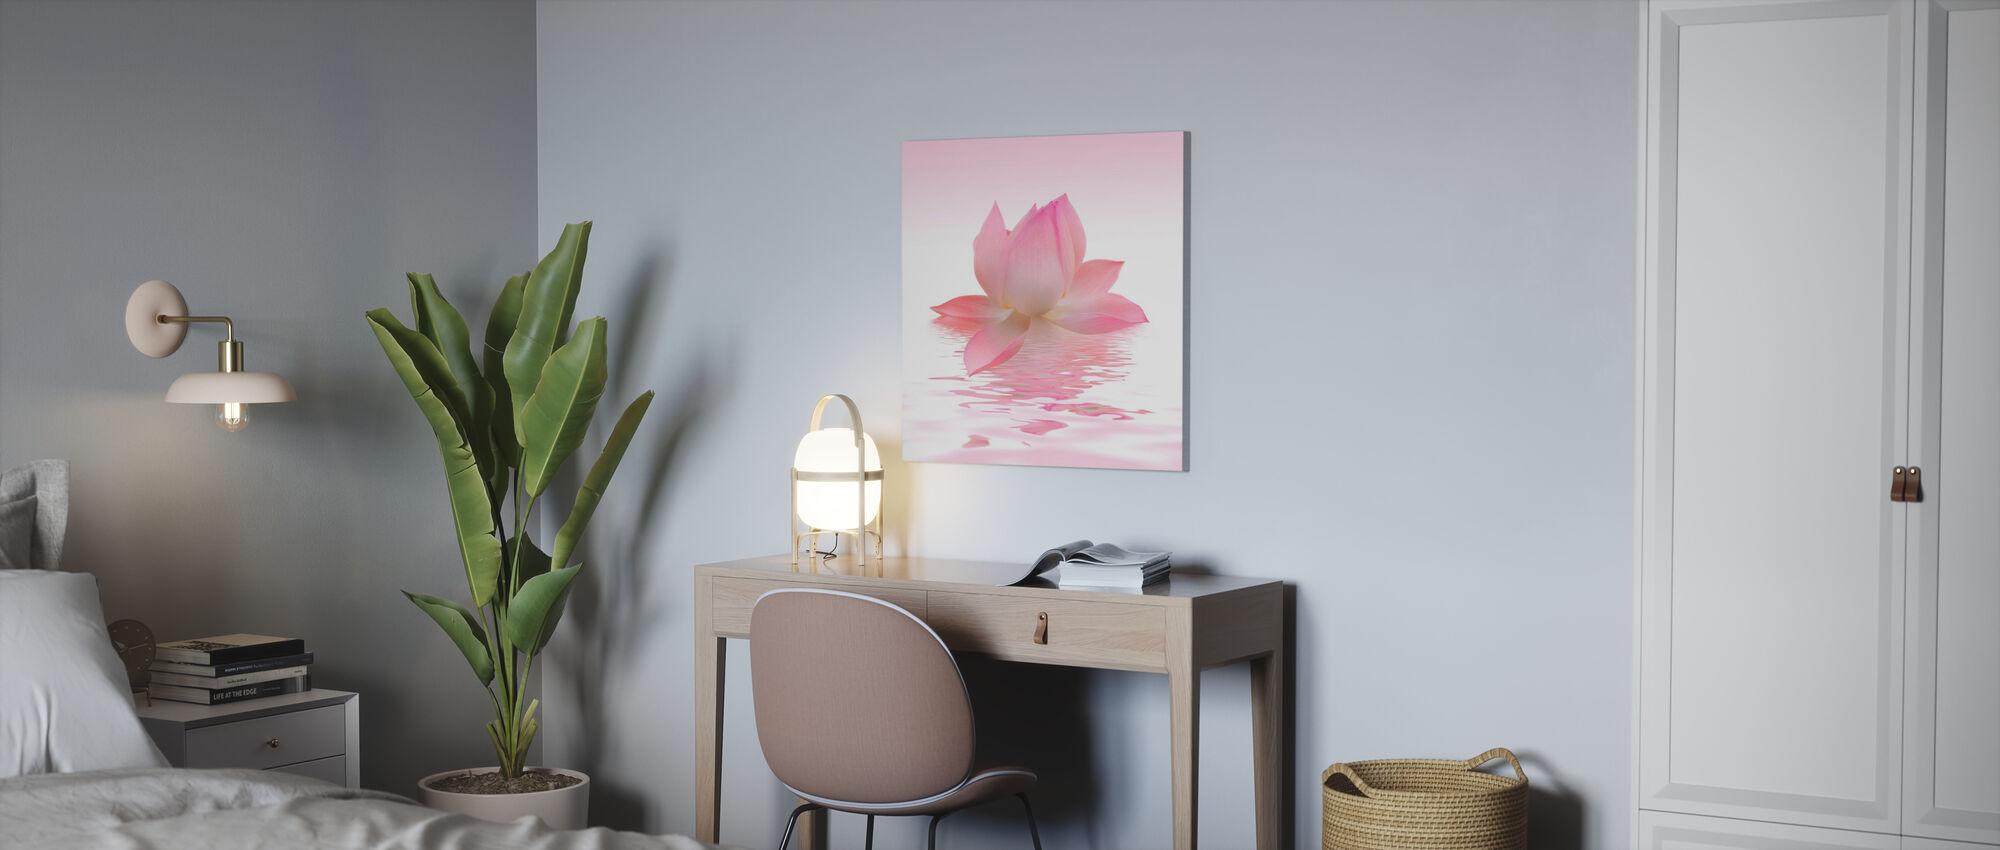 Pink Lotus - Canvas print - Office